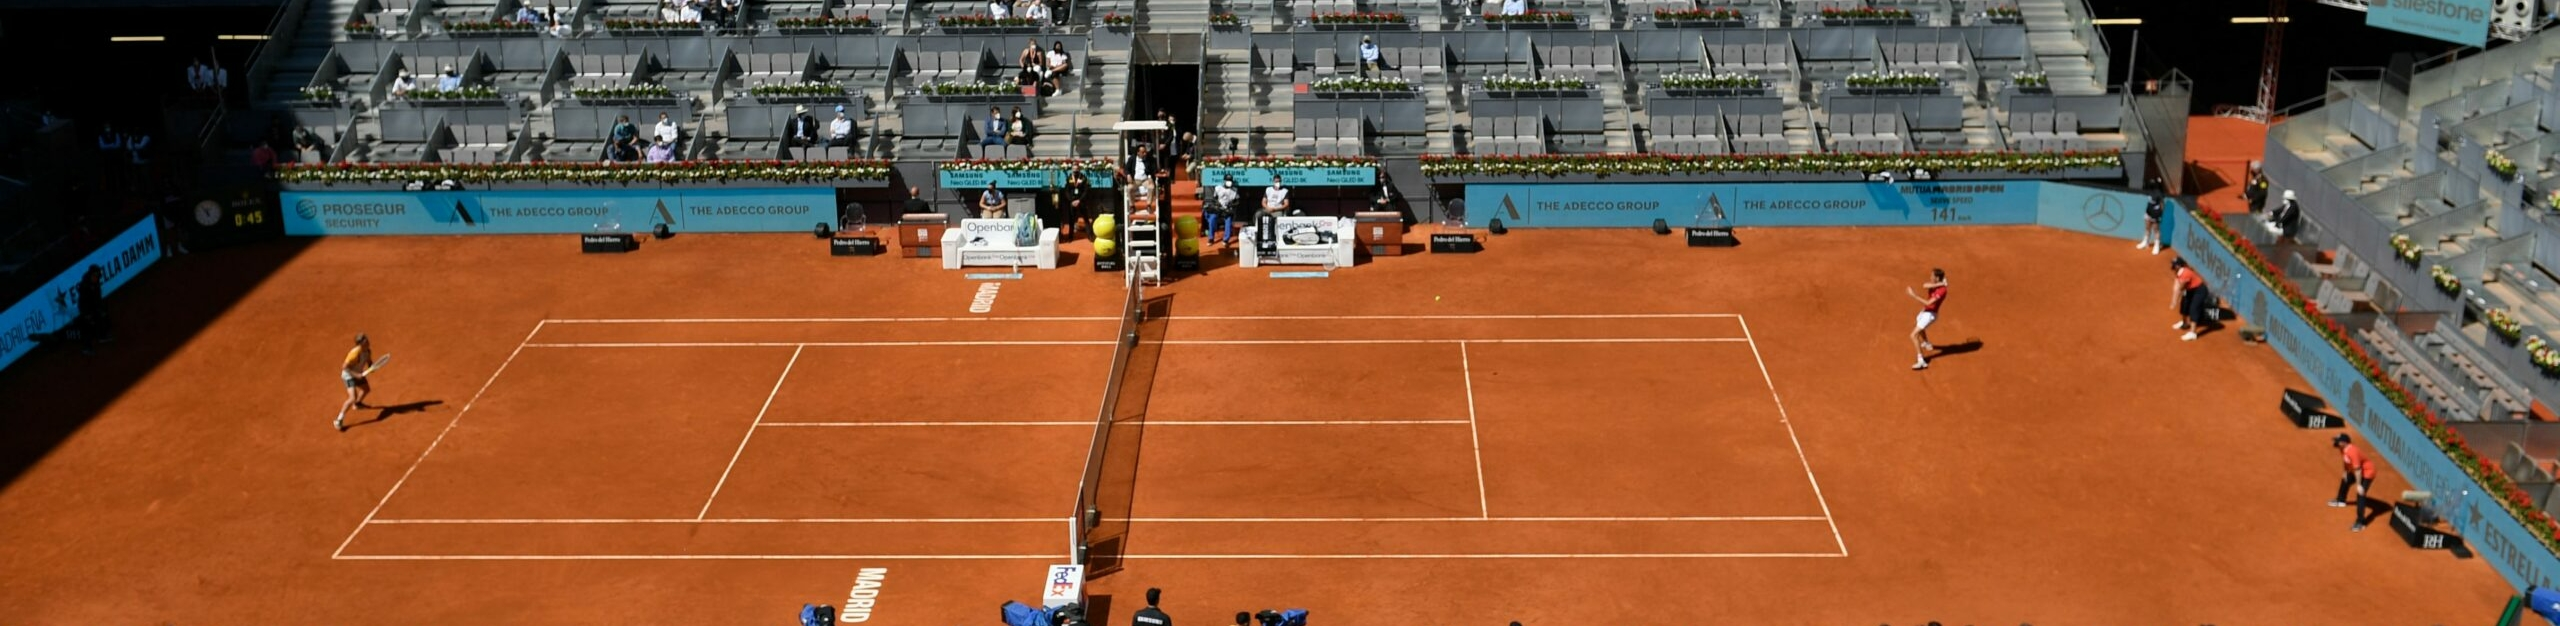 Pronostici ATP Roma: derby Mager-Sonego, per Sinner sua maestà Nadal